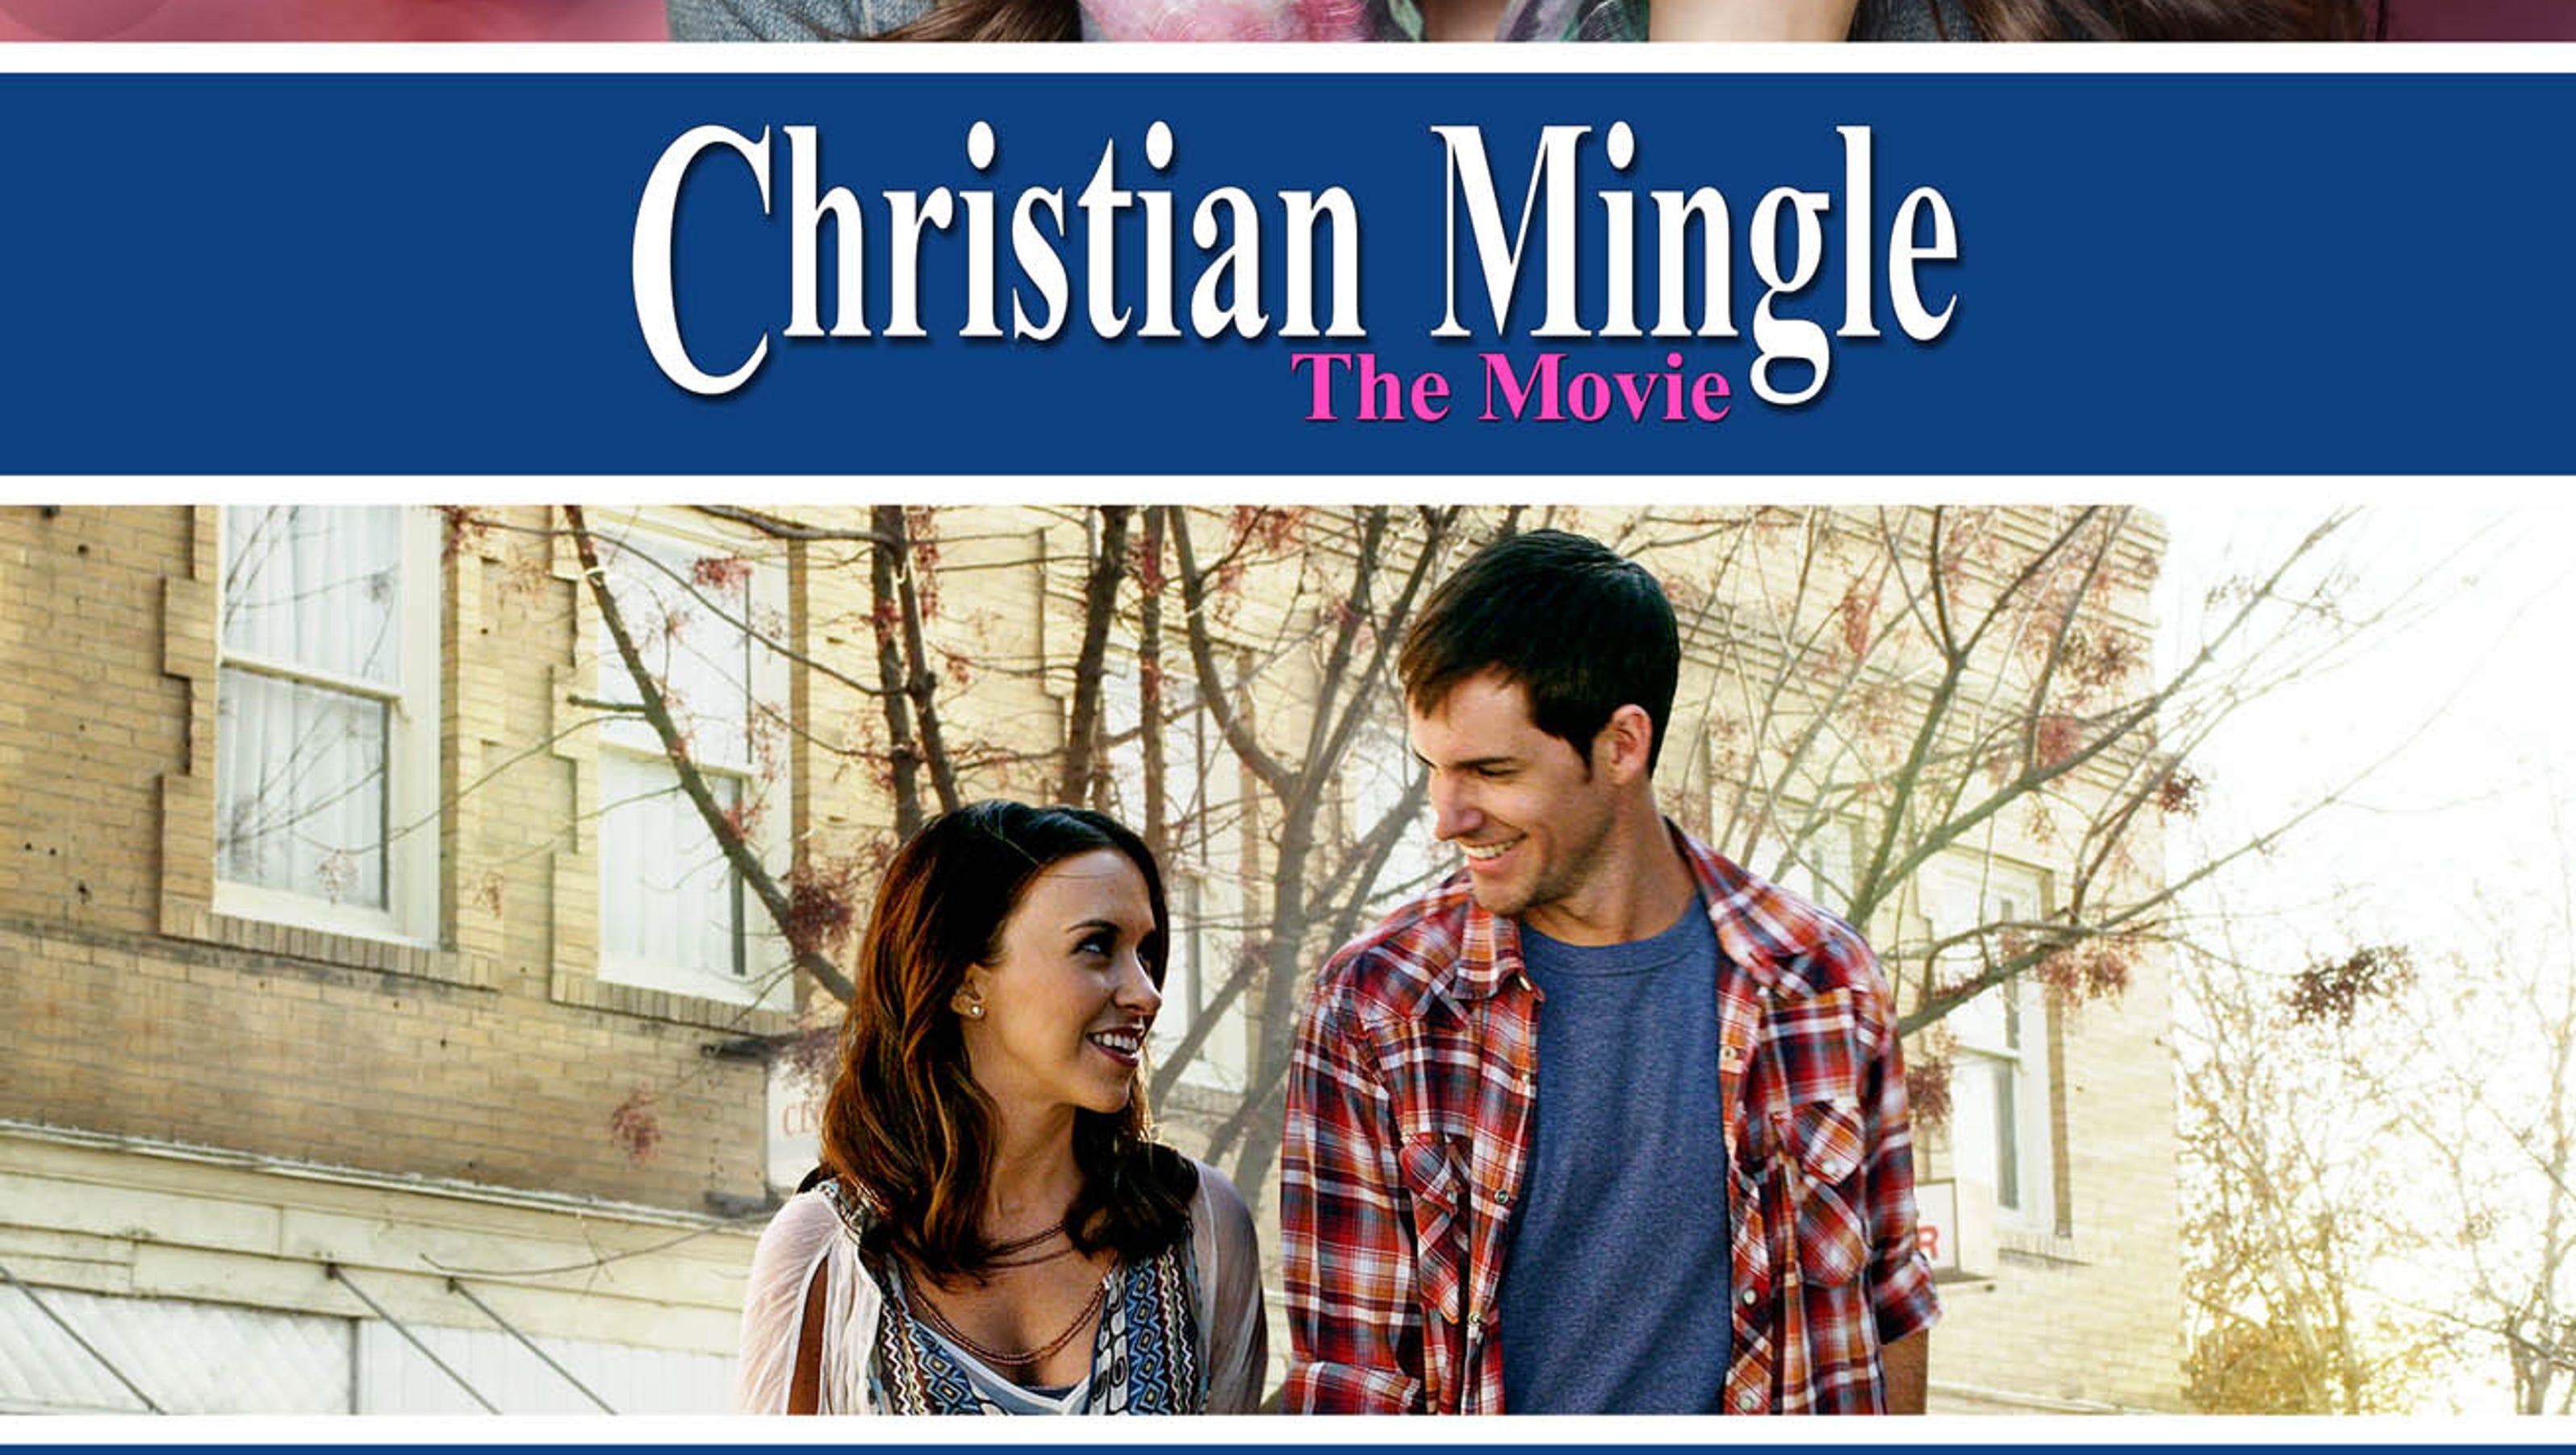 Christian nudist dating site arizona